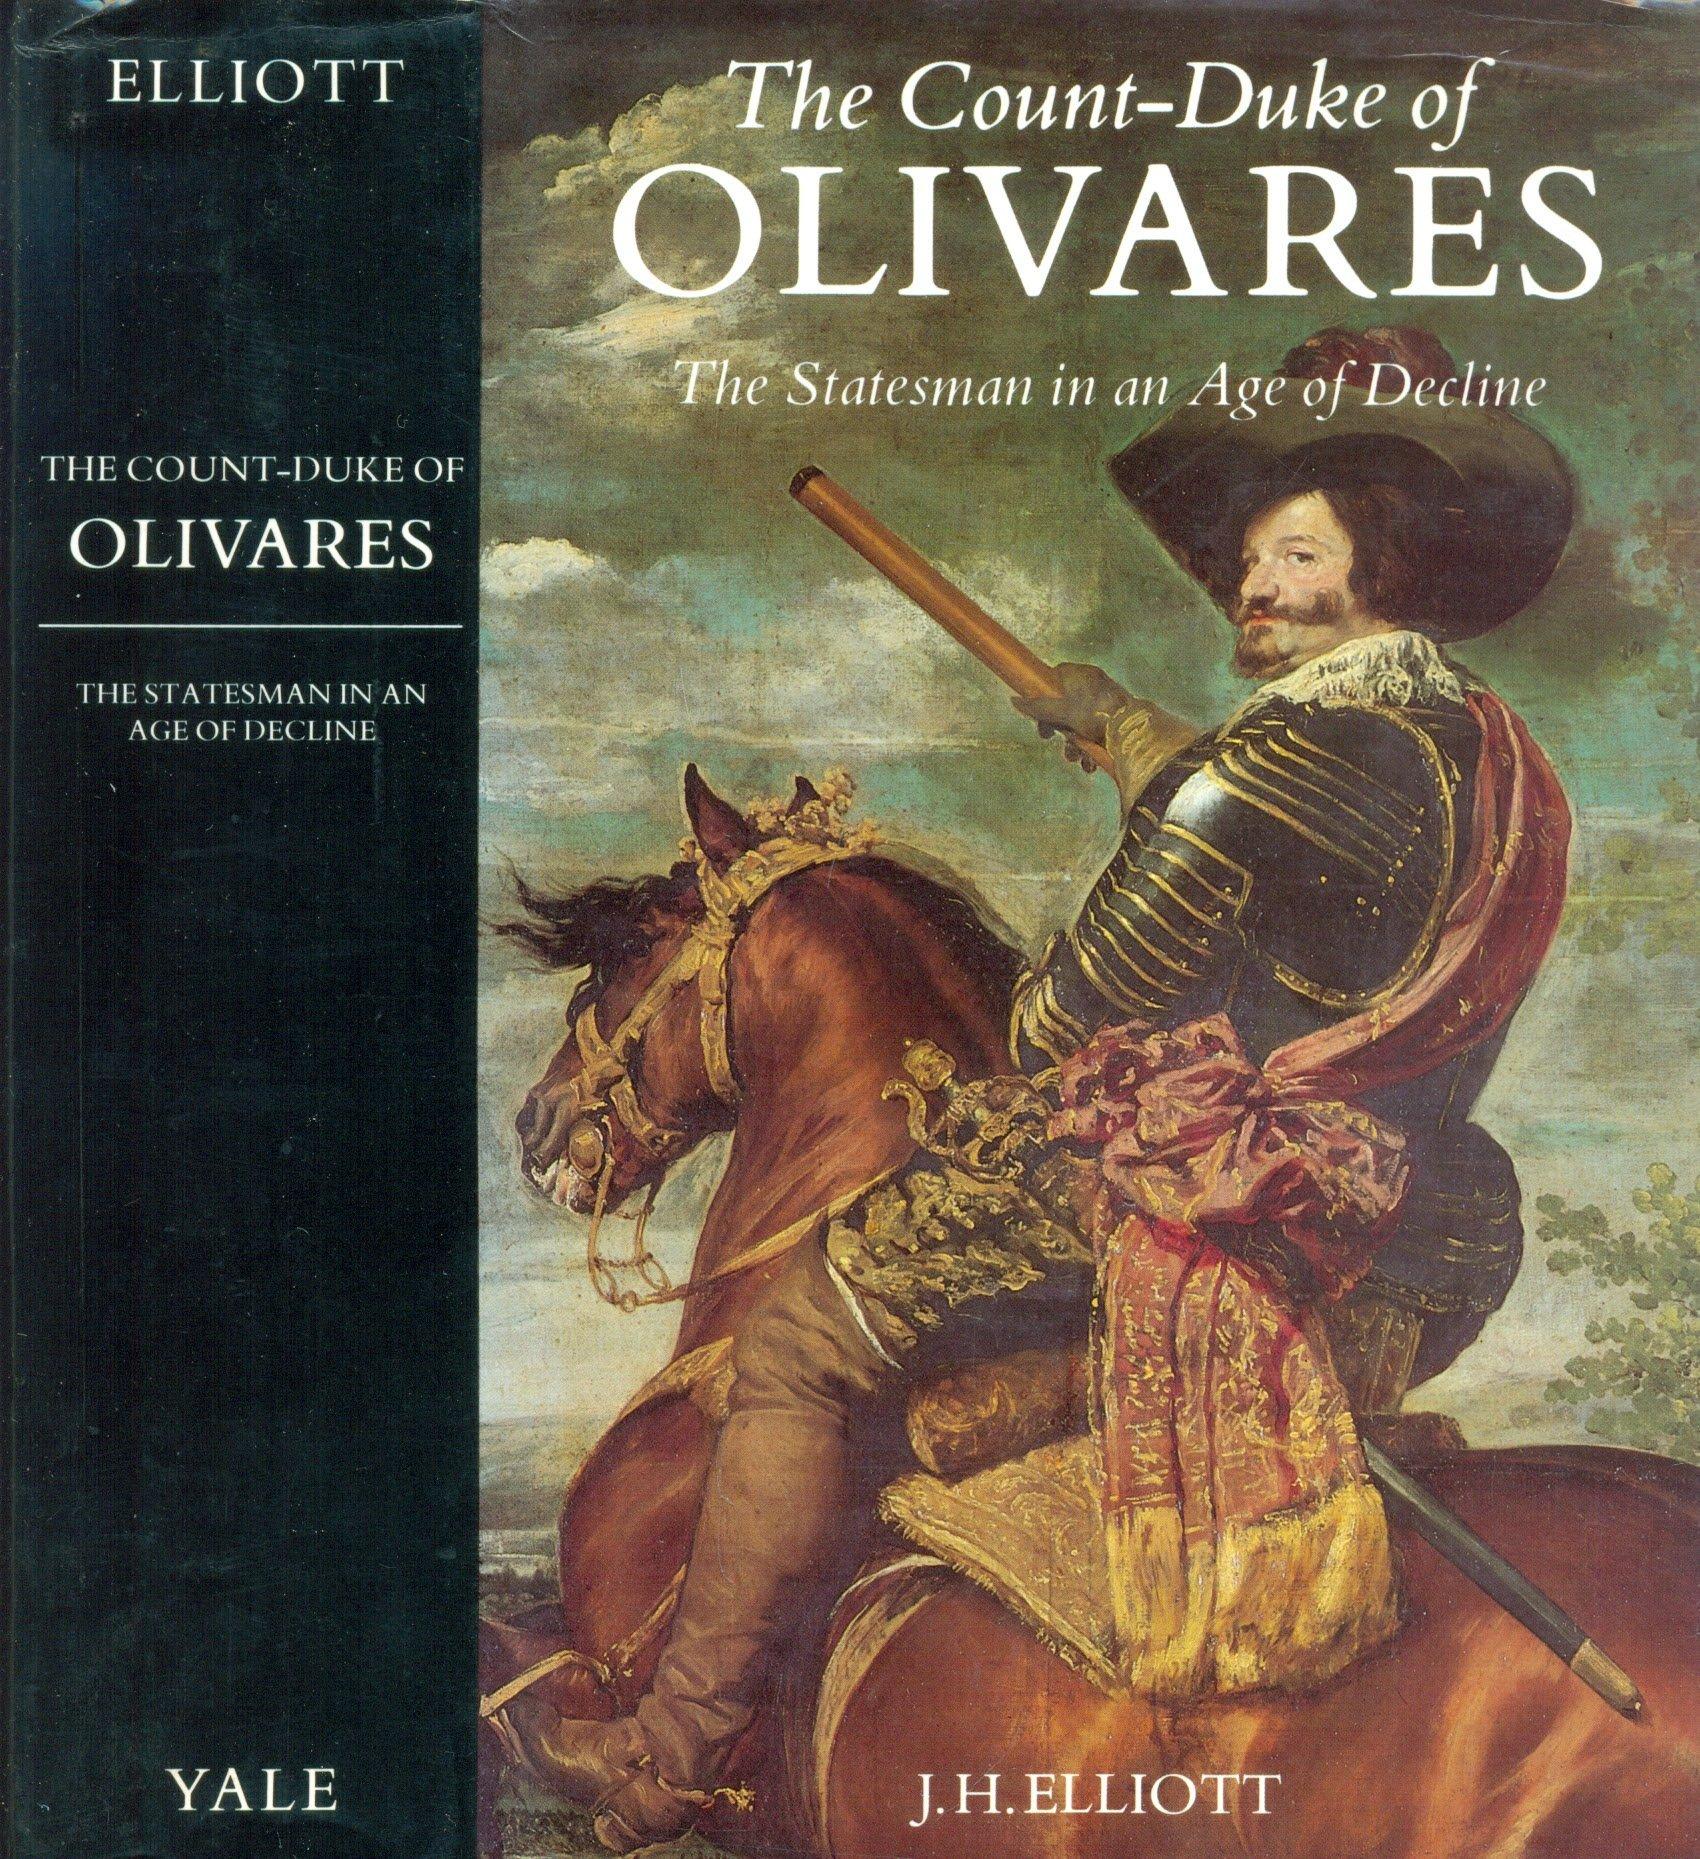 The Count-Duke of Olivares: Statesman in an Age of Decline: Amazon.es: Elliott, J. H.: Libros en idiomas extranjeros